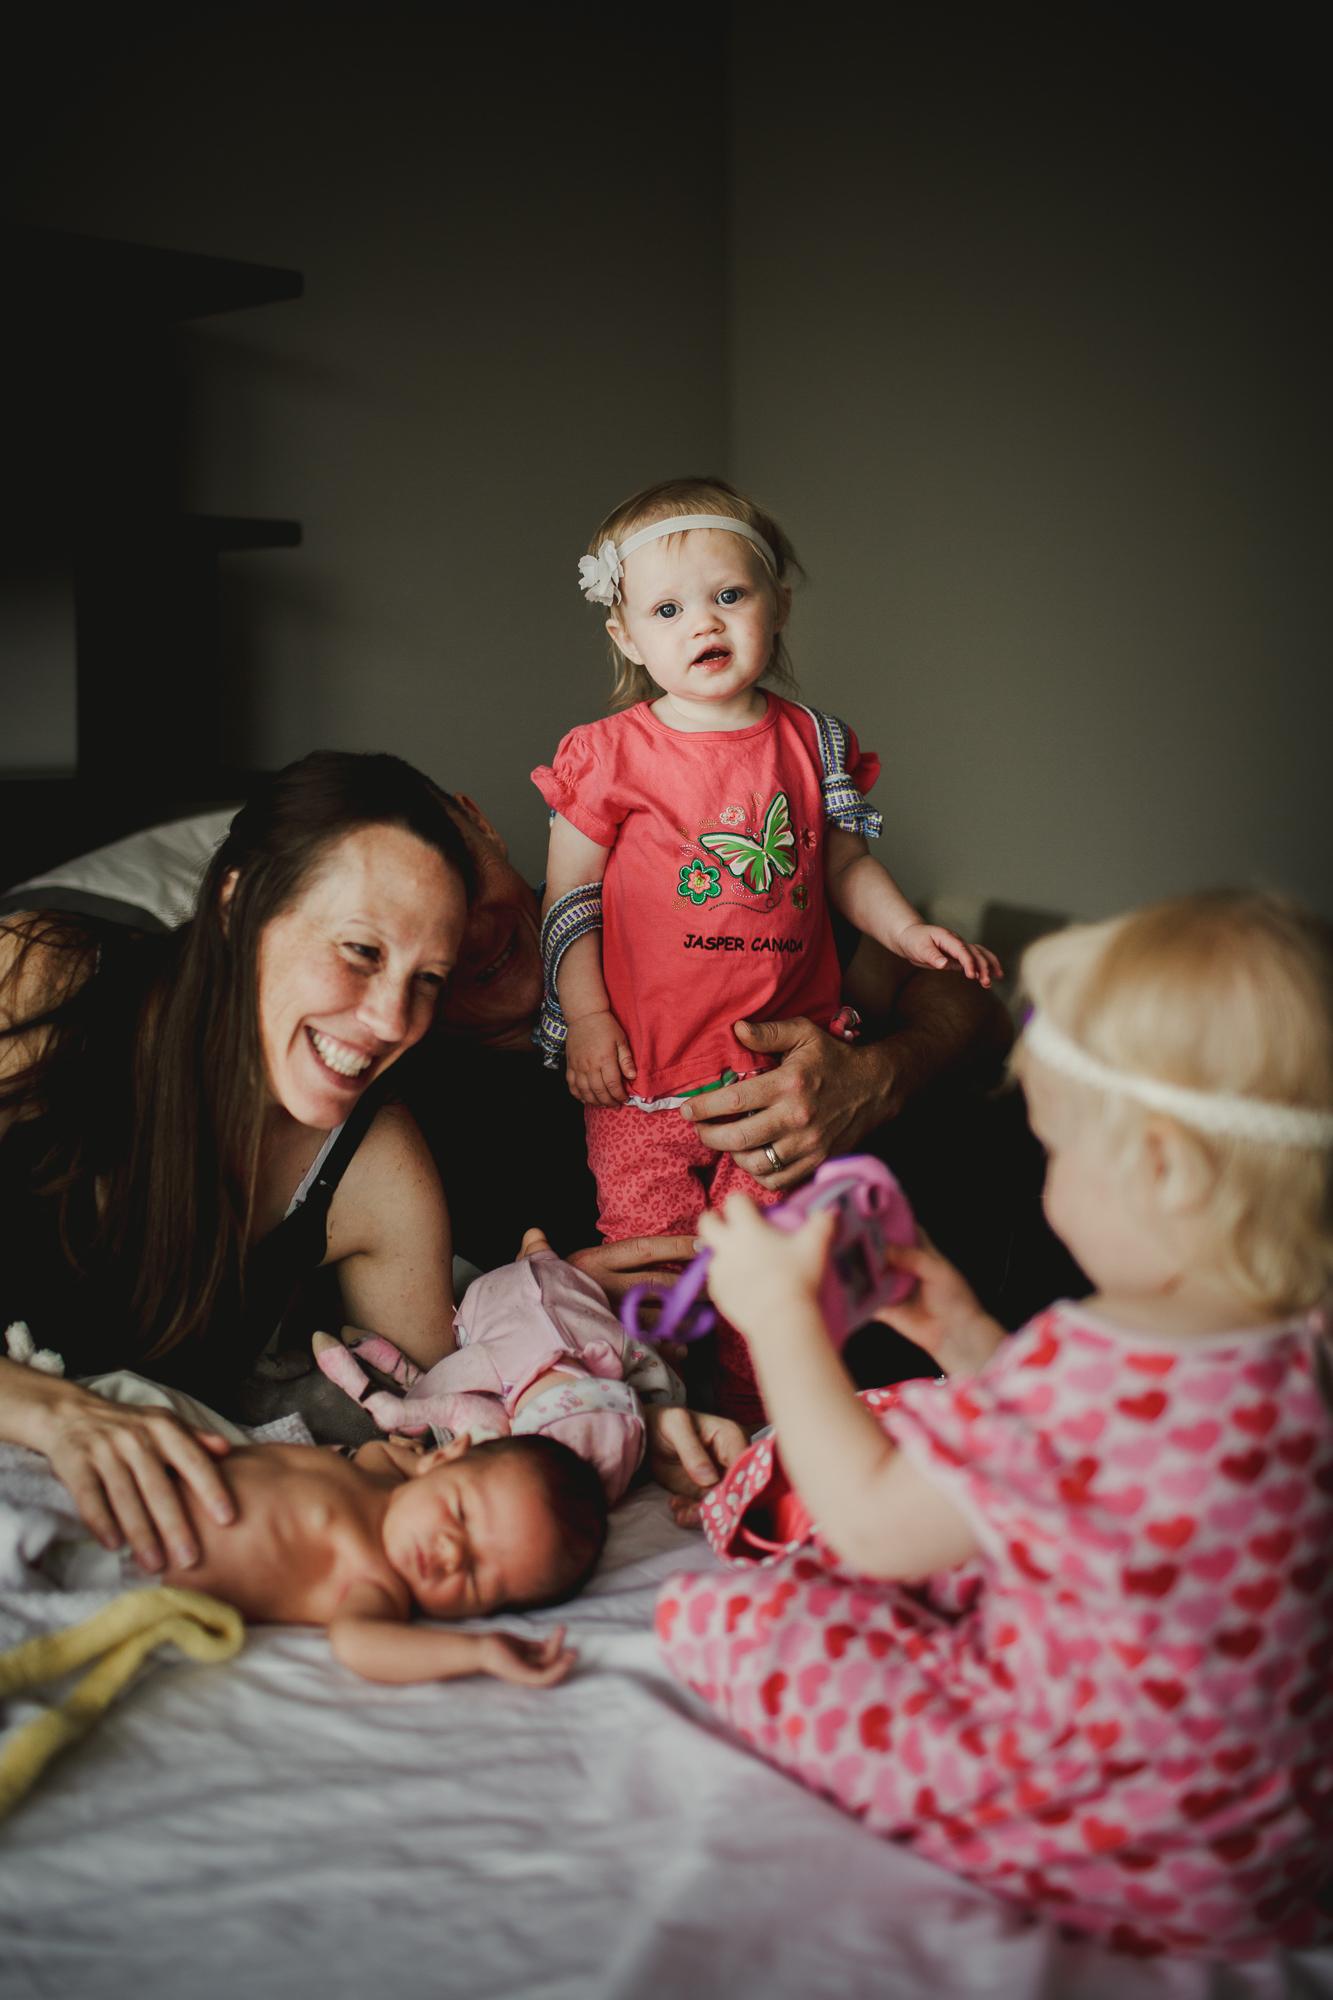 seattle newborn lifestyle family photos by Krista Welch-0023.jpg